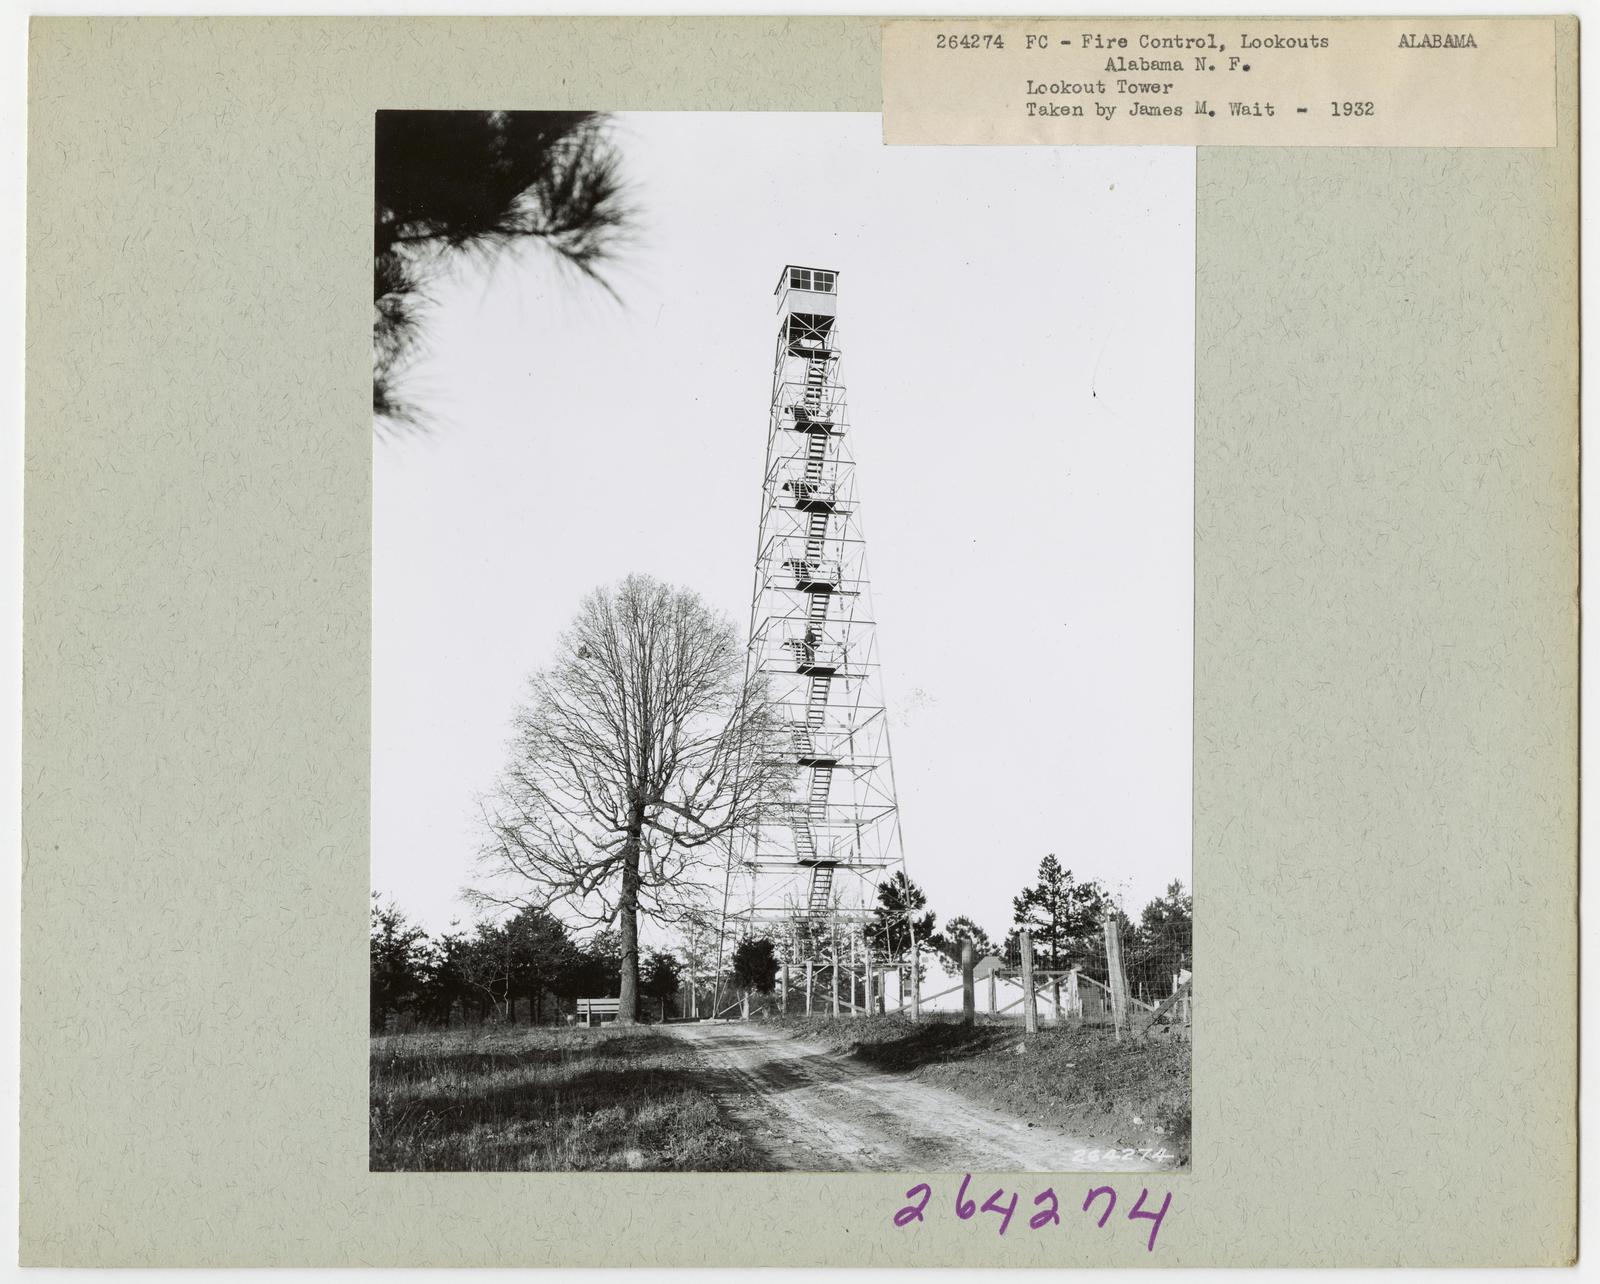 Fire Control: Lookouts - Alabama